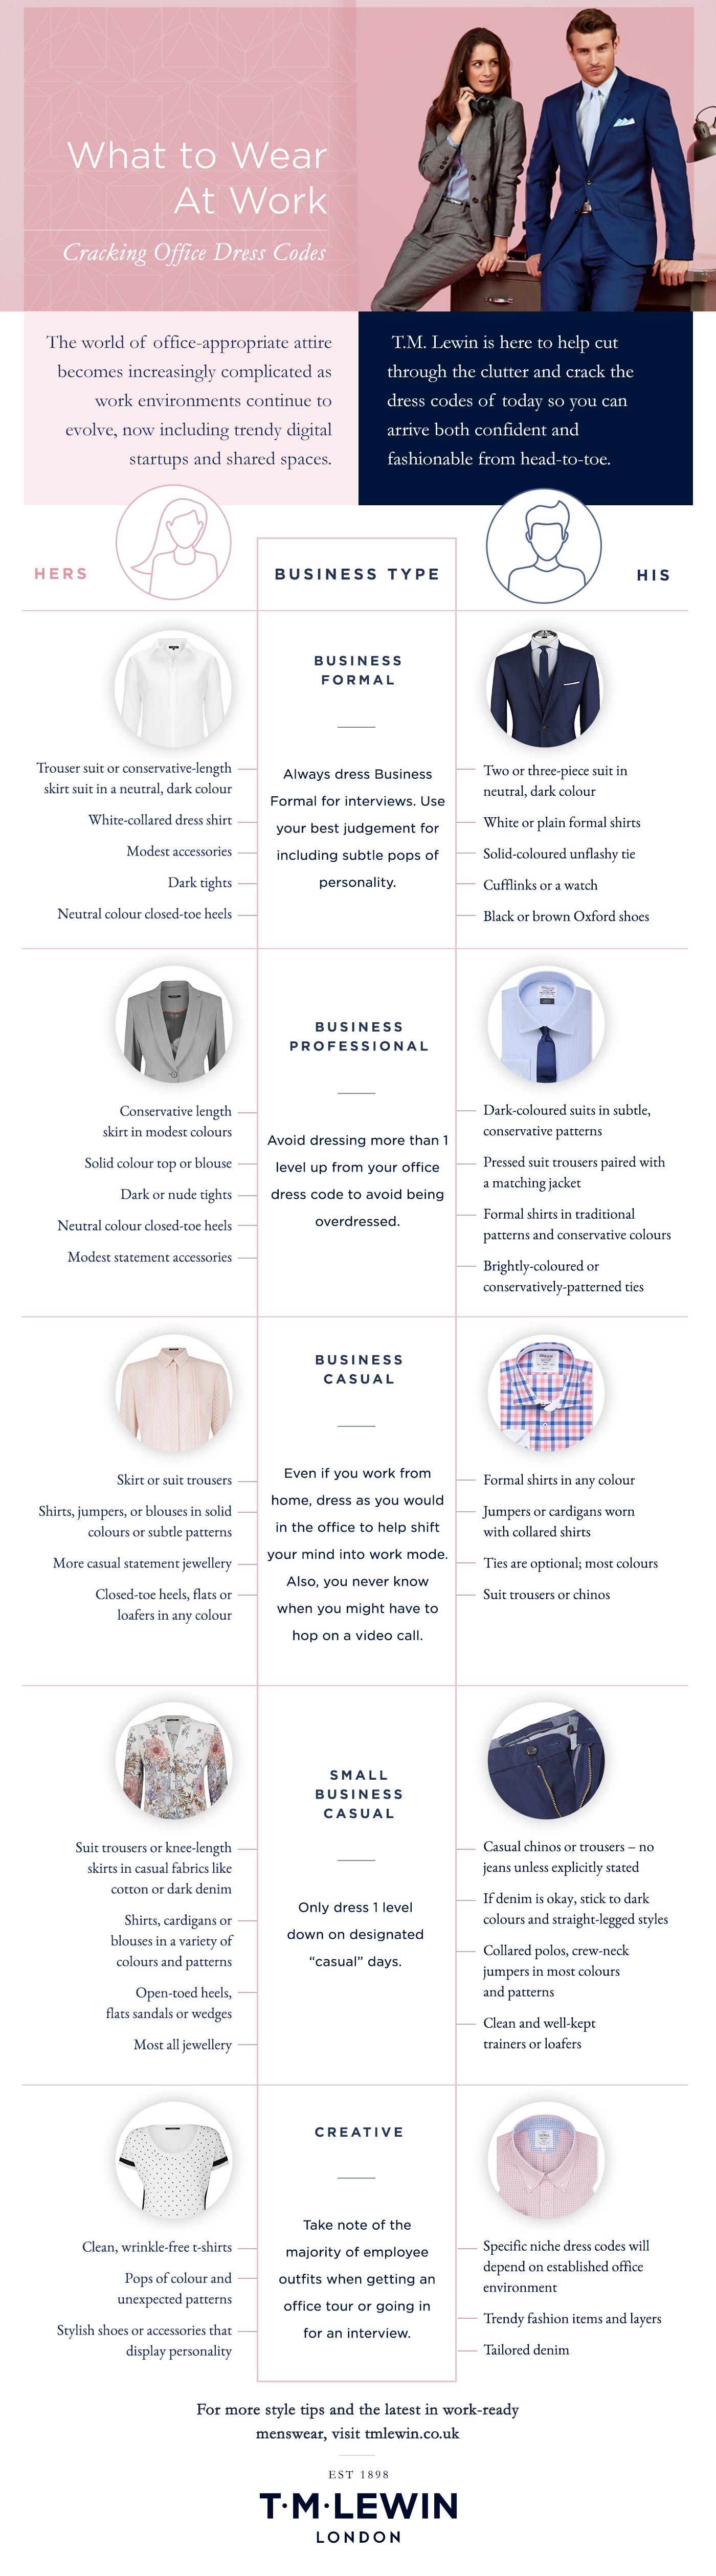 Navigating Workplace Dress Codes